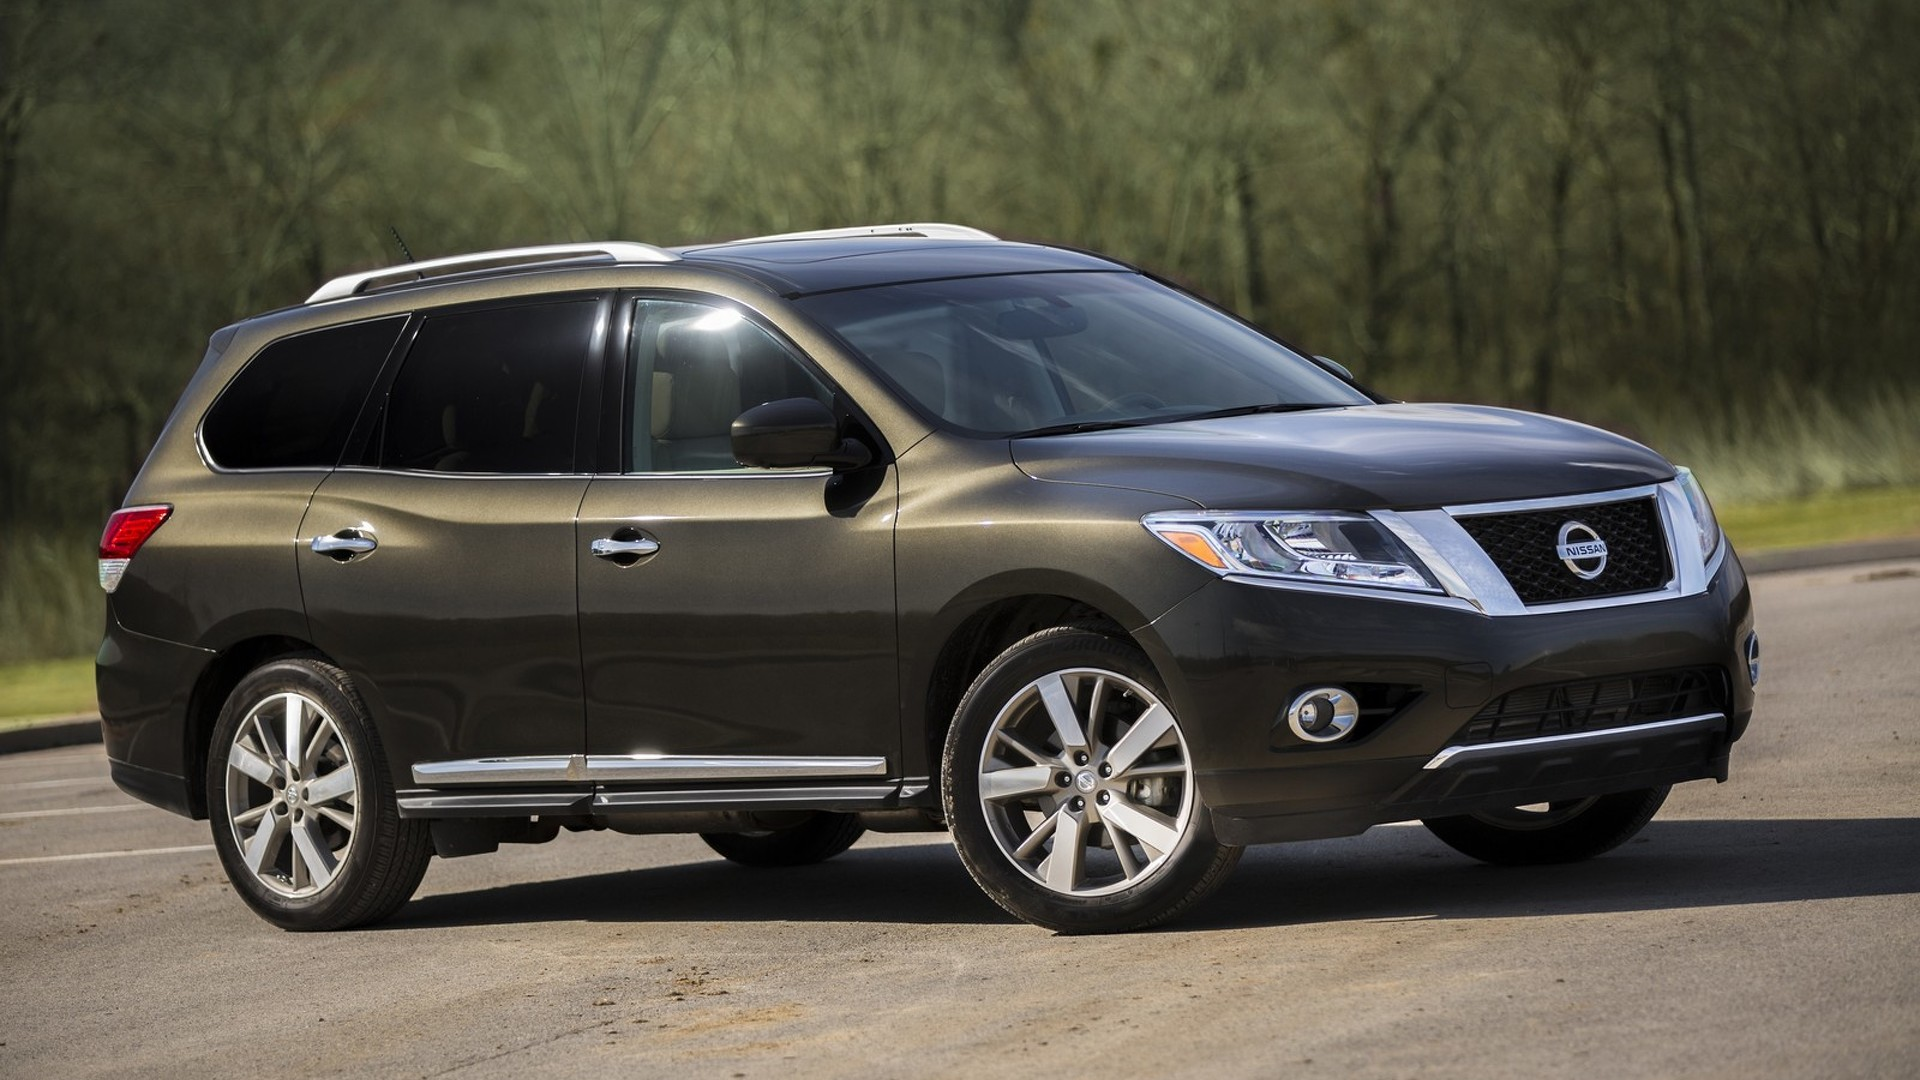 Nissan Pathfinder News and Reviews | Motor1 com